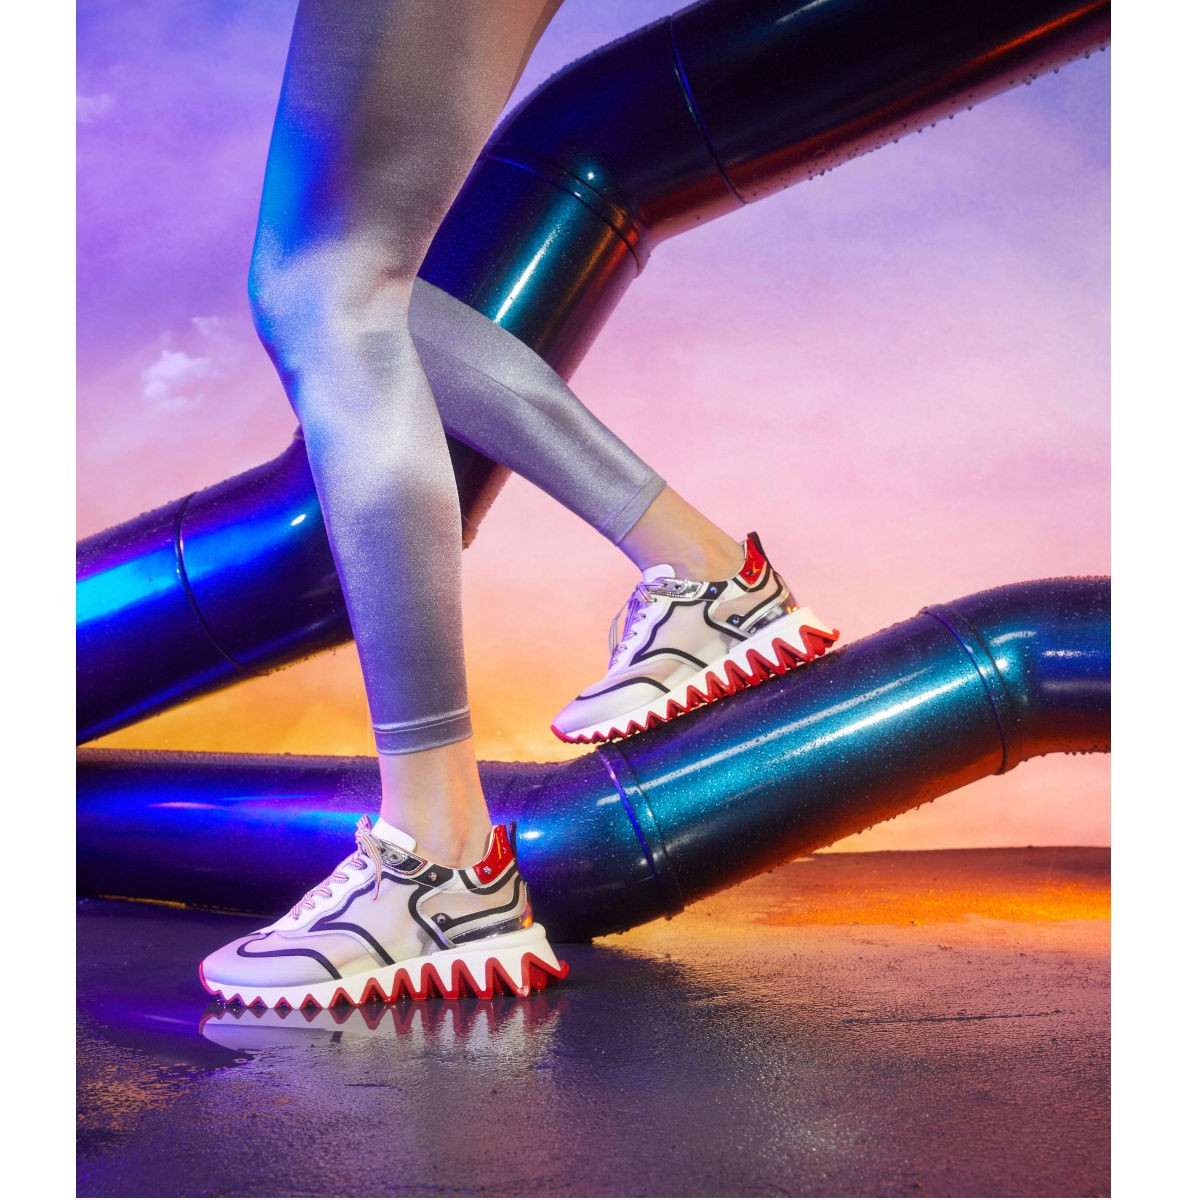 Shoes - Sharkina - Christian Louboutin